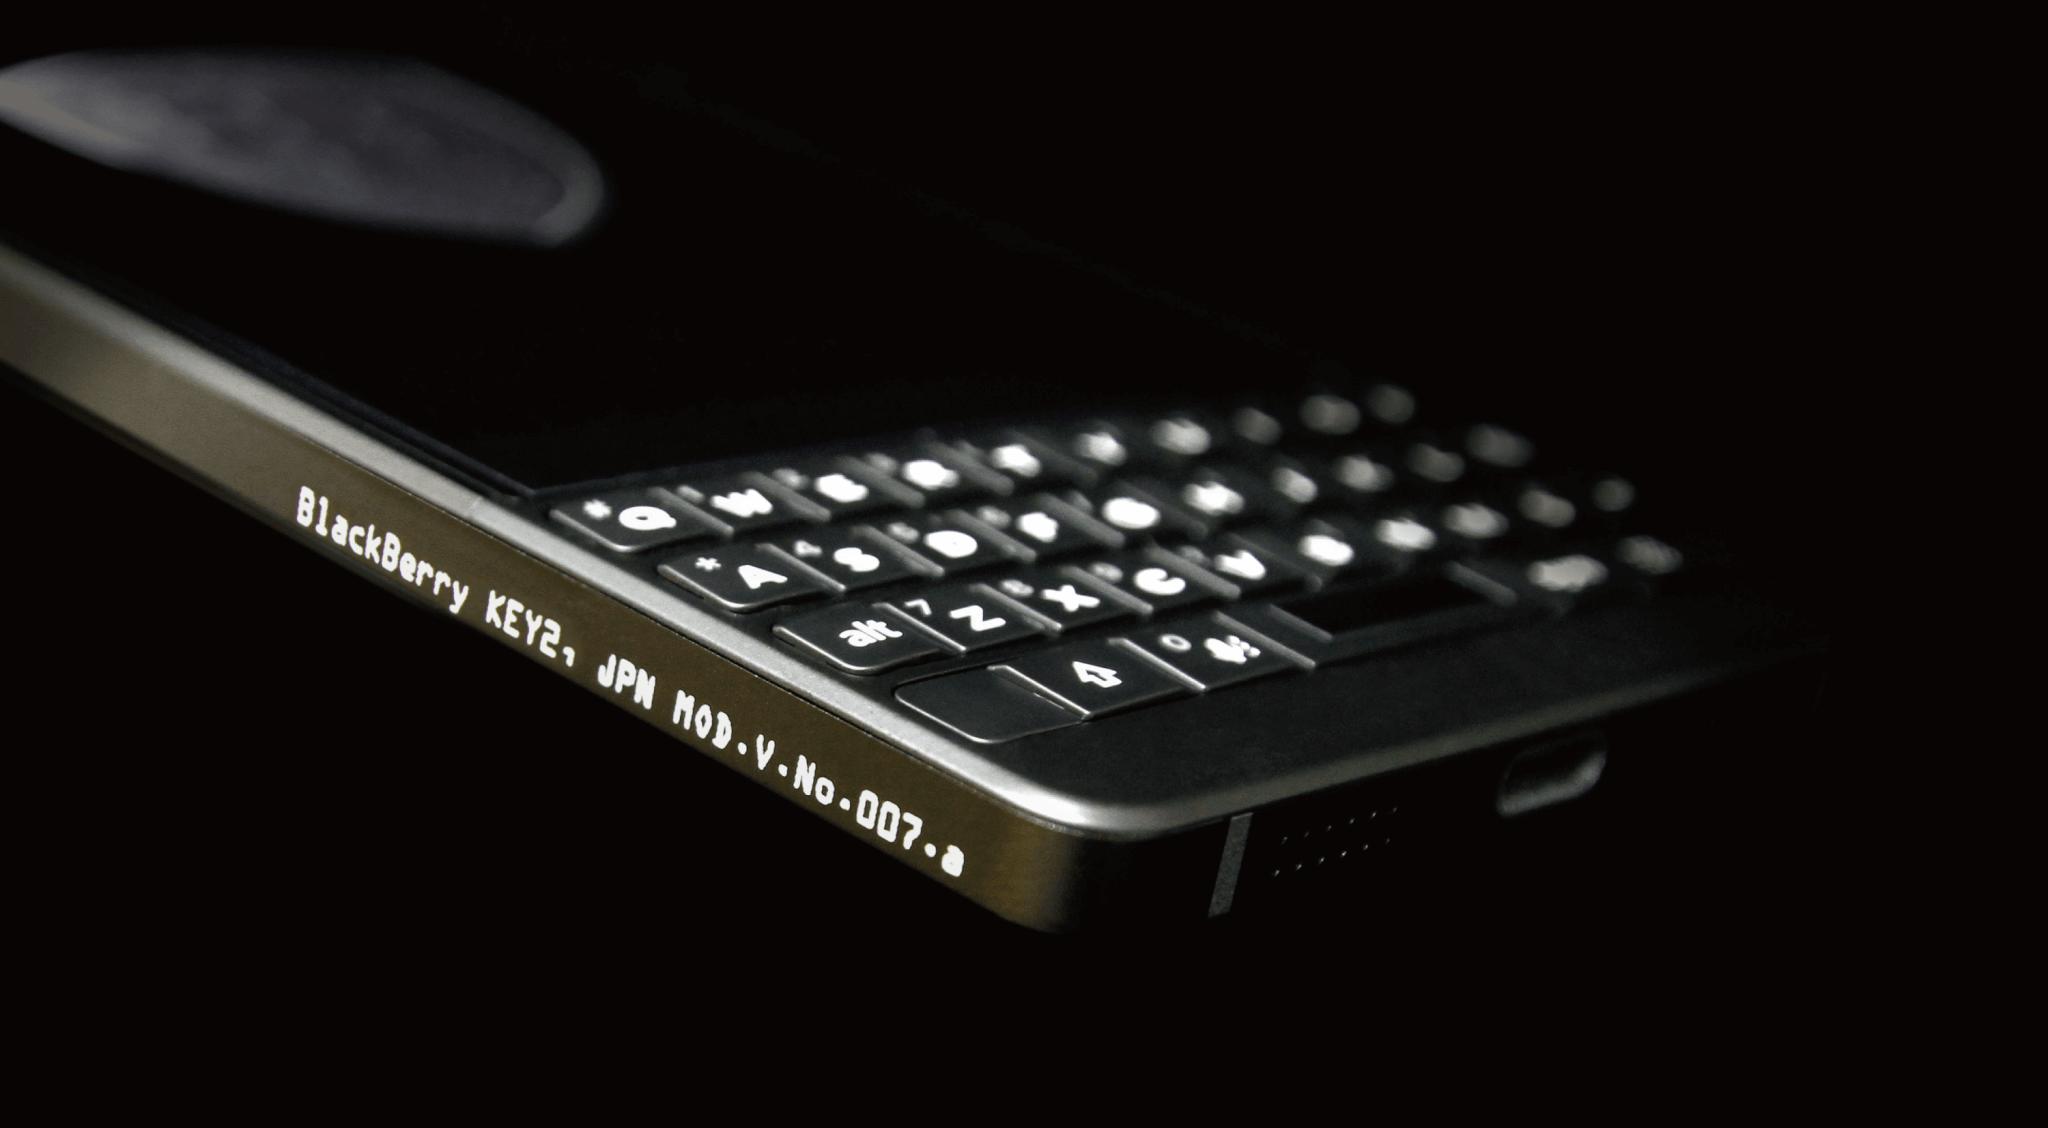 BlackBerry KEY2 Last Edition